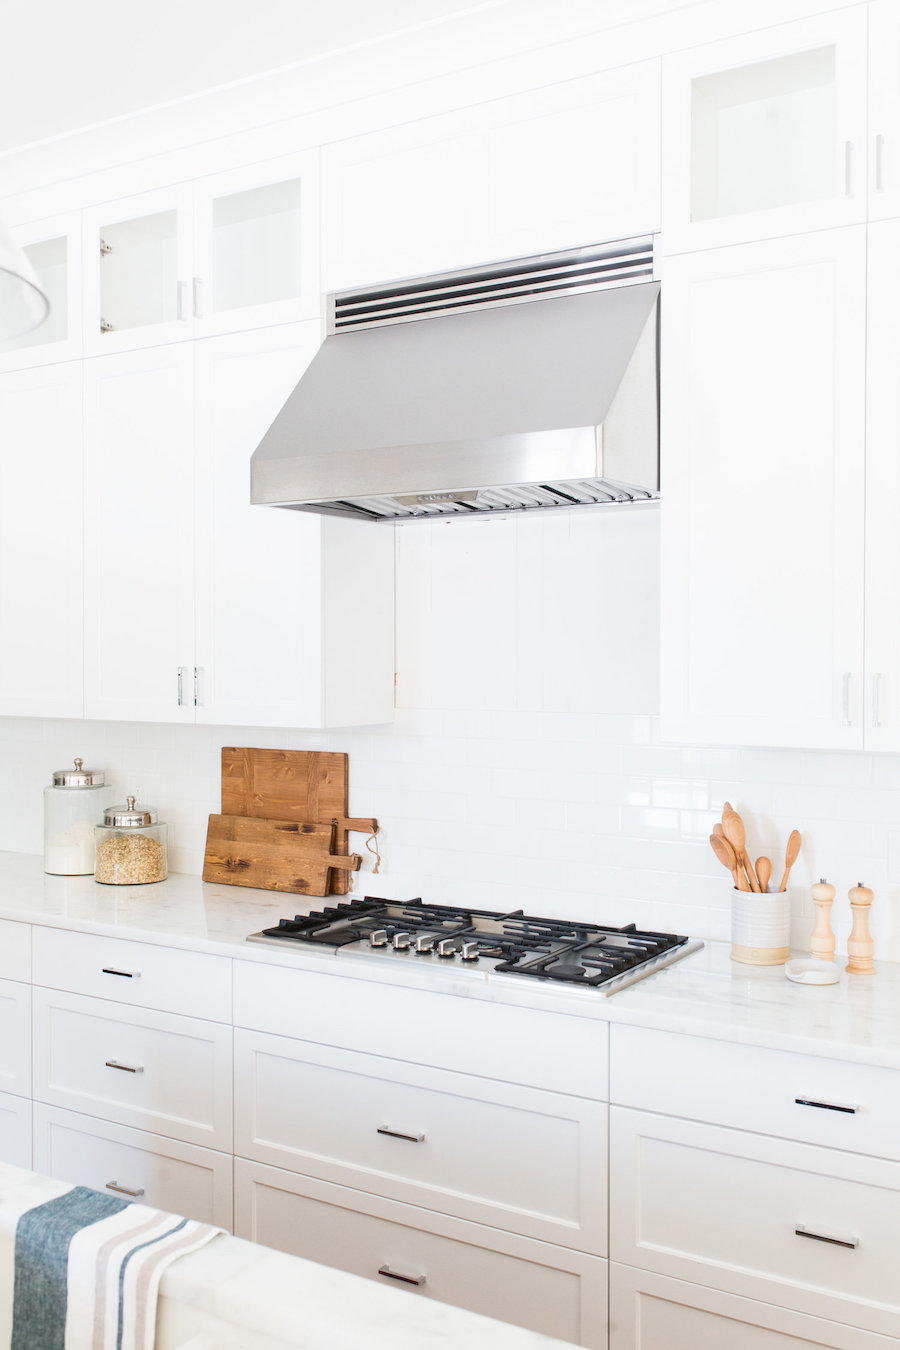 Wood Cutting Board in white kitchen via Studio McGee